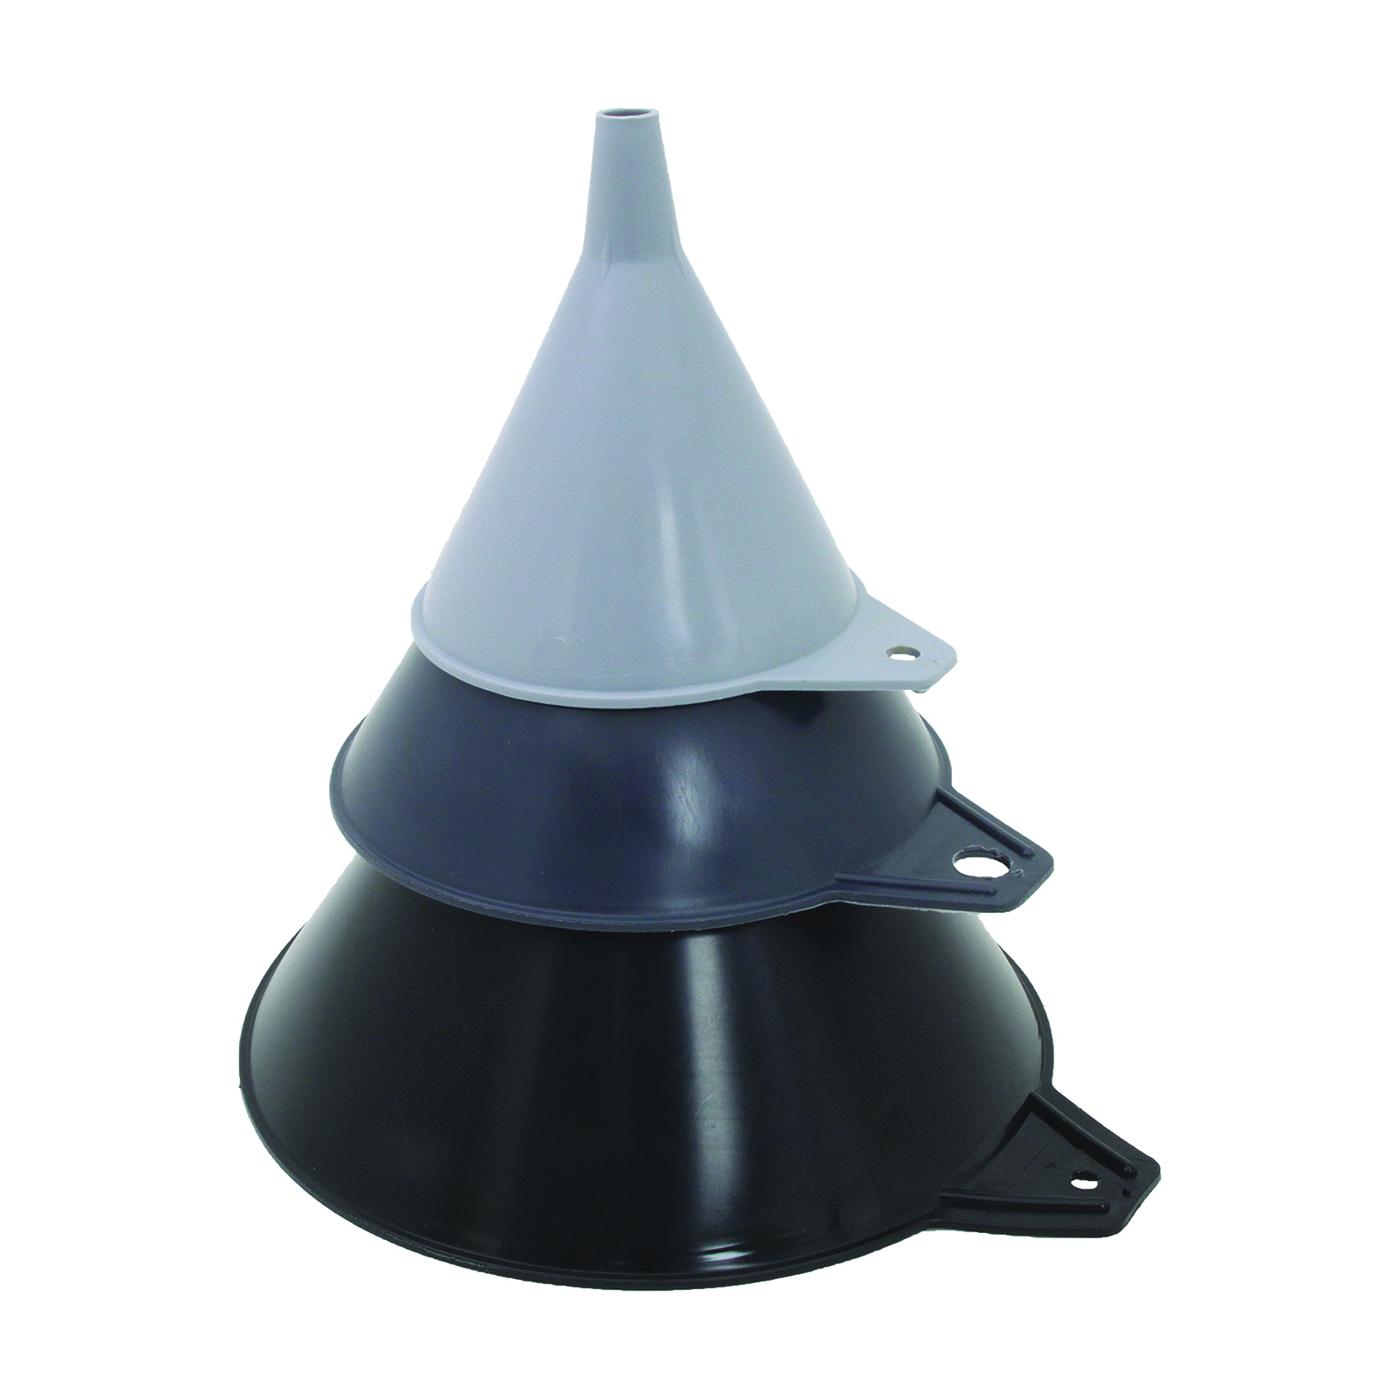 Picture of FloTool 05068 Funnel Set, High-Density Polyethylene